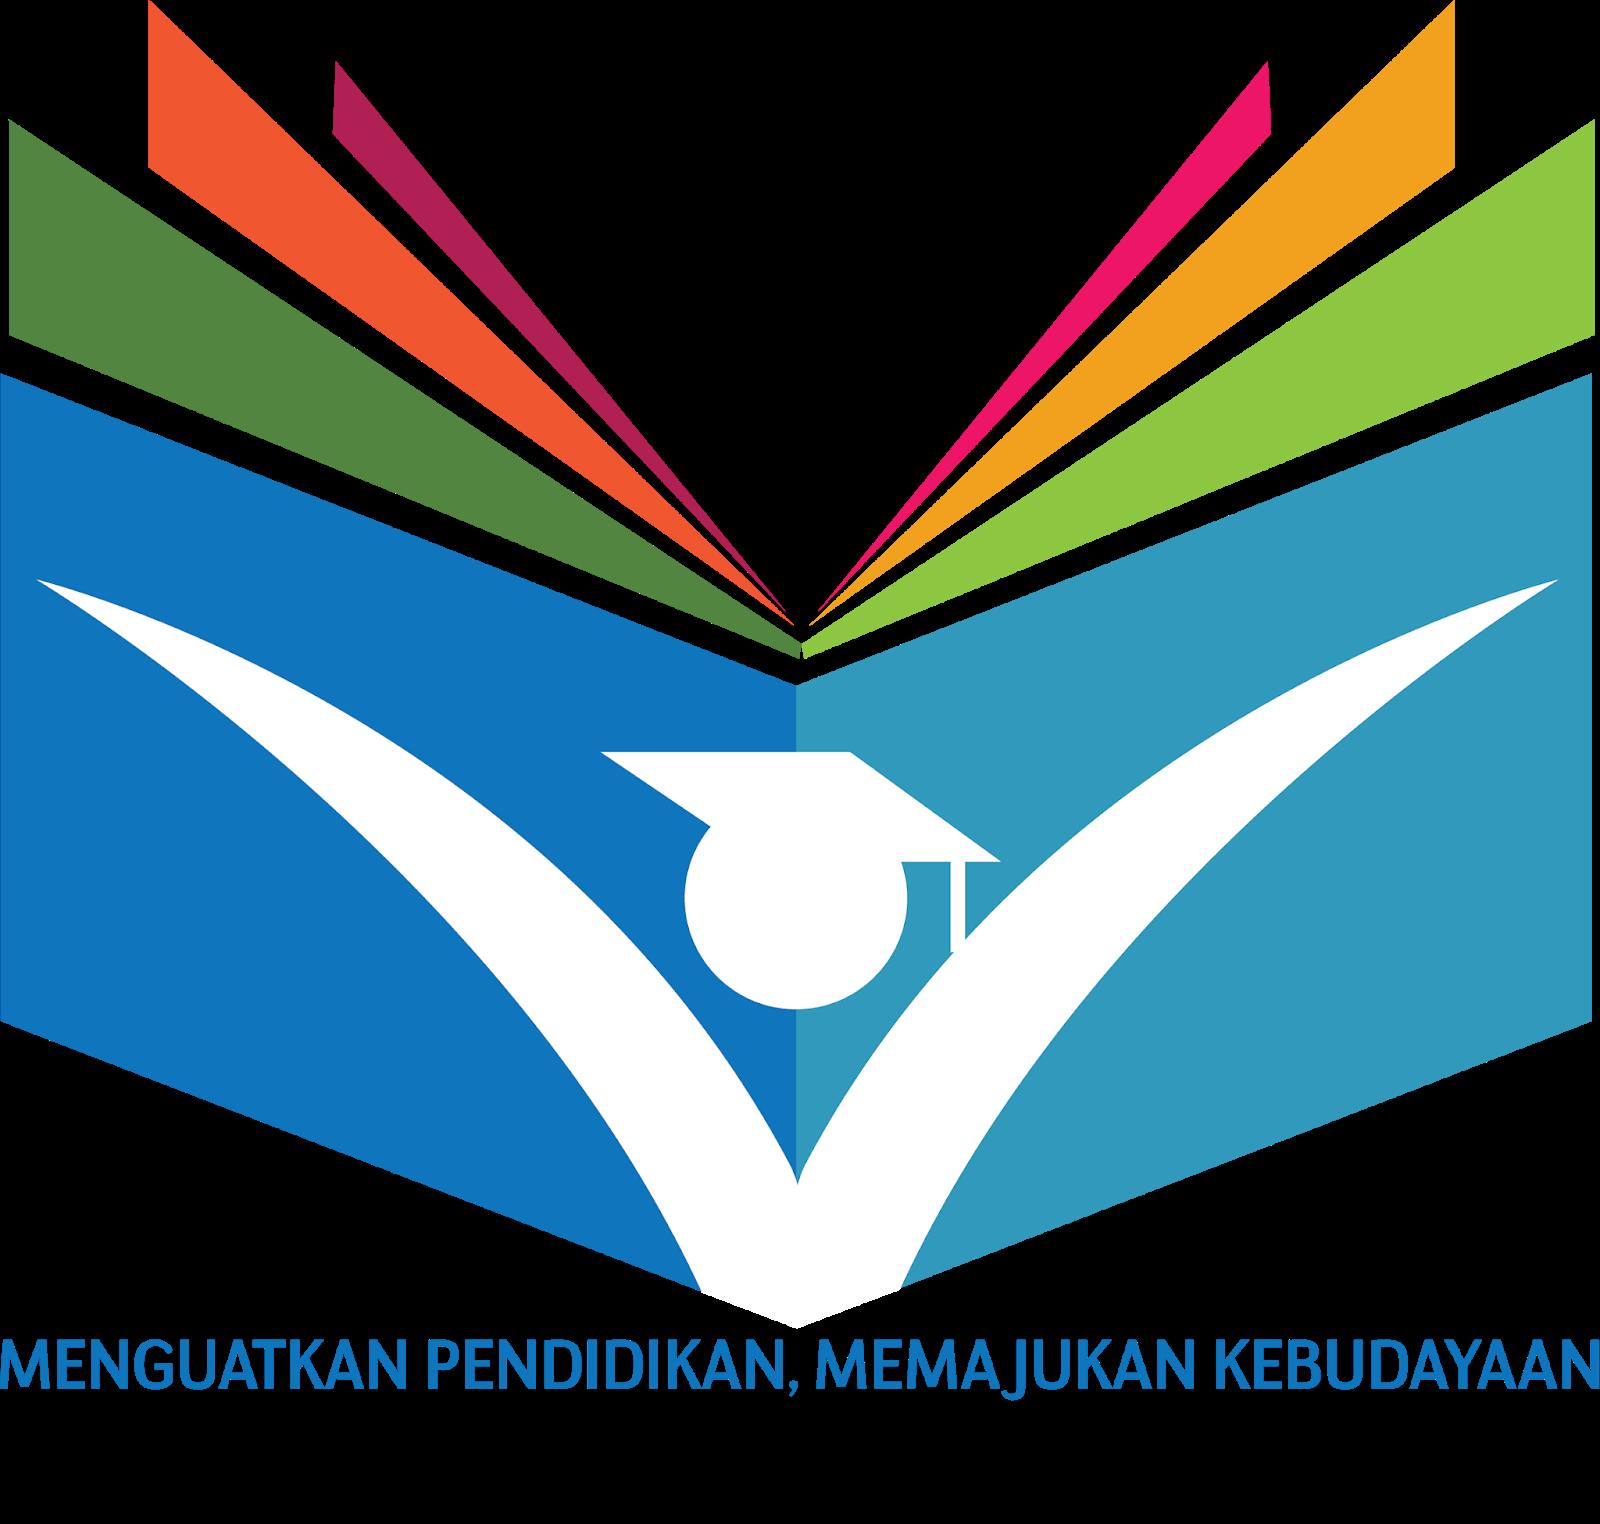 ingin menunjukkan isu yg di keluarrkan oleh Menteri Pendidikan dan Kebudayaan  Download Pedoman Peringatan Hardiknas Tahun 2018